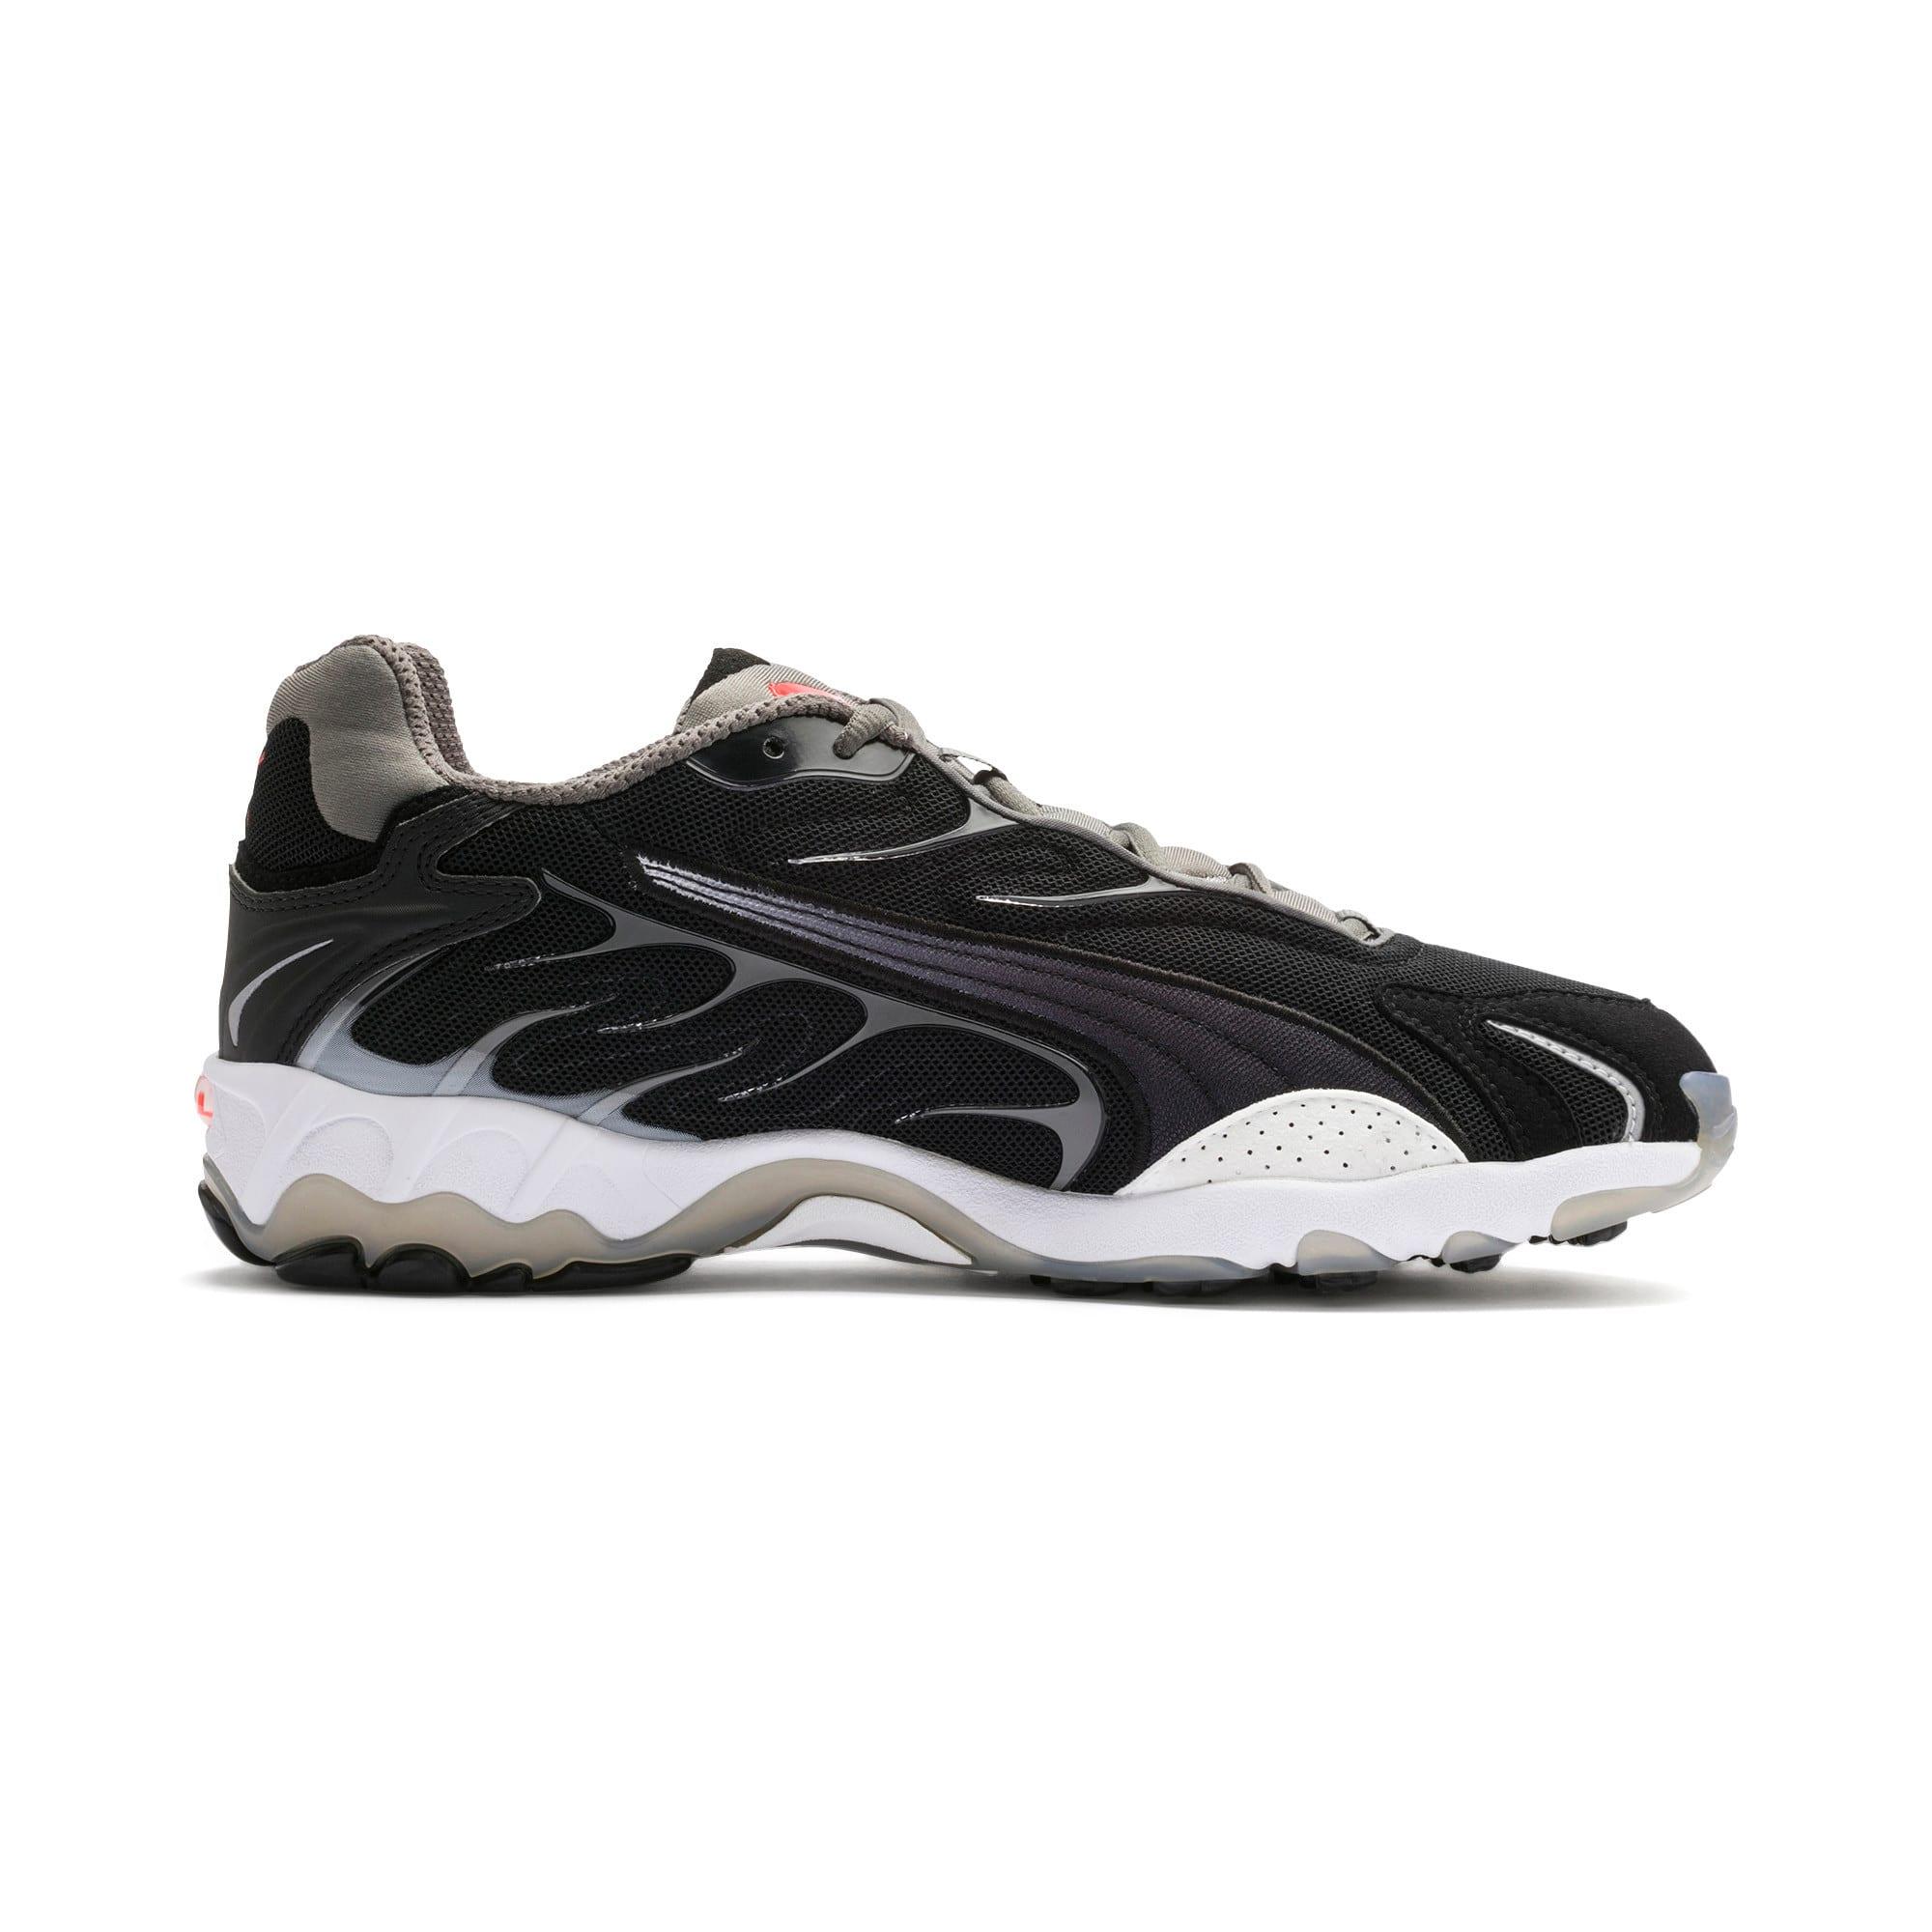 Thumbnail 6 of Inhale Flares Sneakers, Puma Black-Puma White, medium